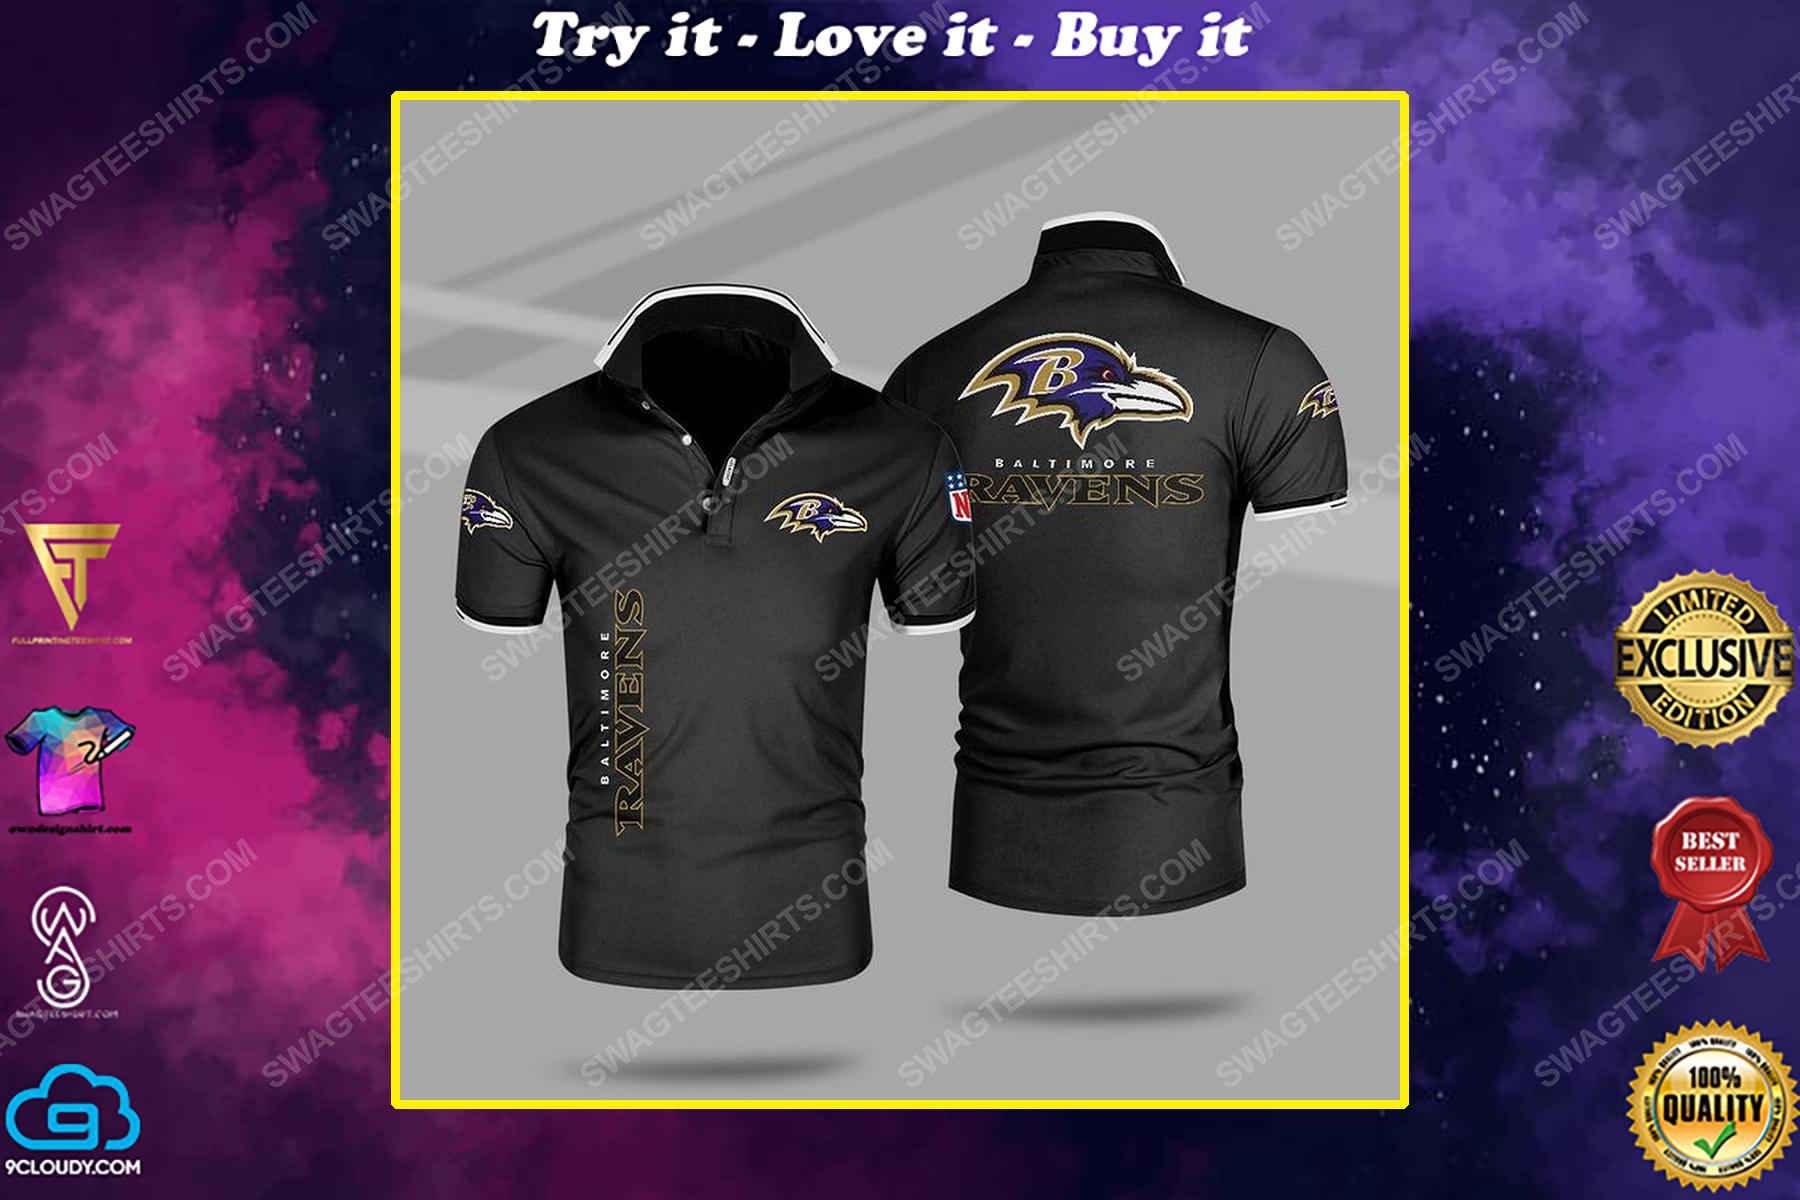 The baltimore ravens nfl all over print polo shirt